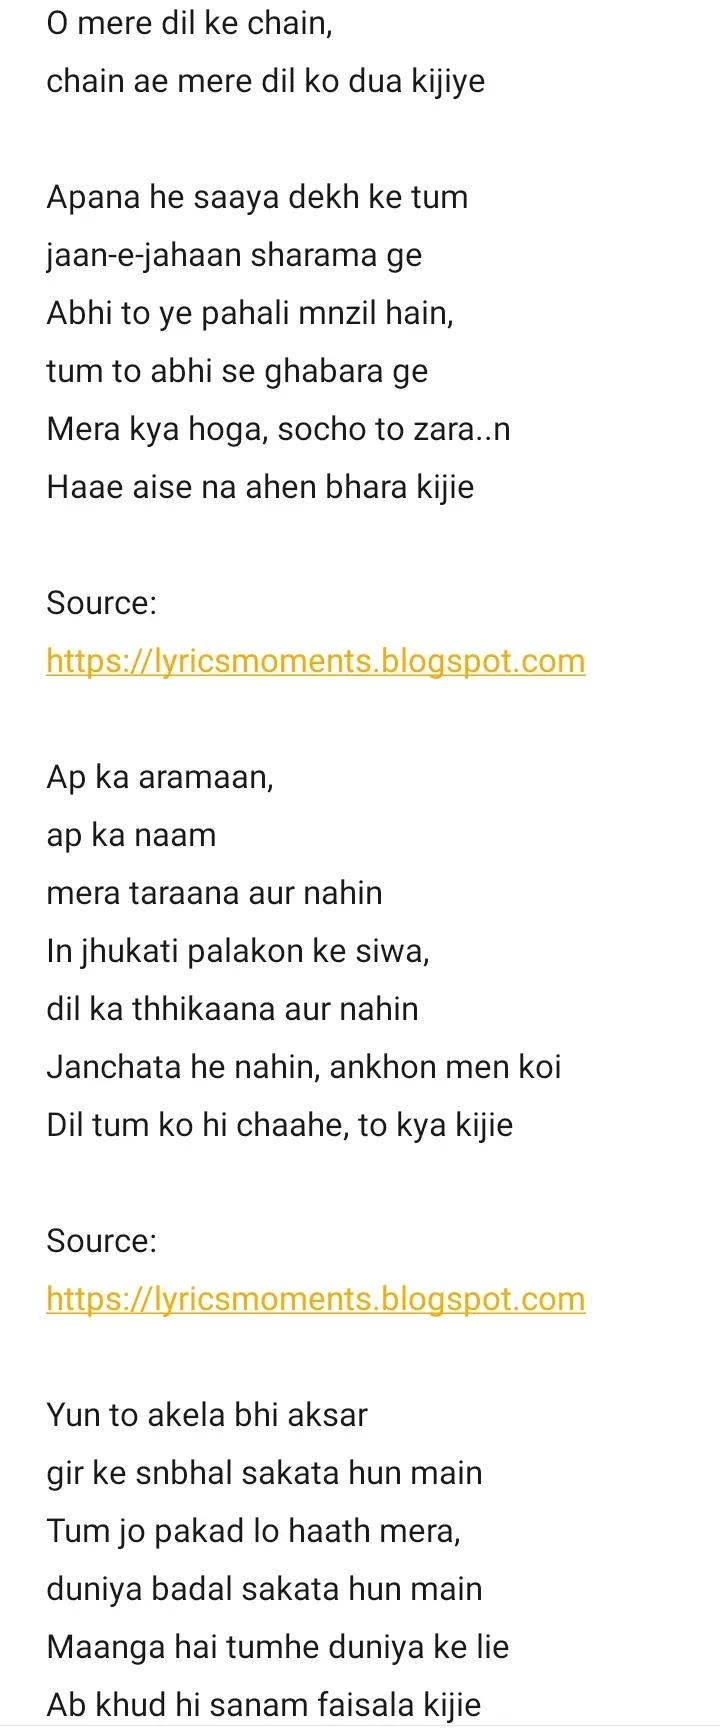 O mere Dil ke chain lyrics- kishore kumar | mere Jeevan Saathi | sanam band